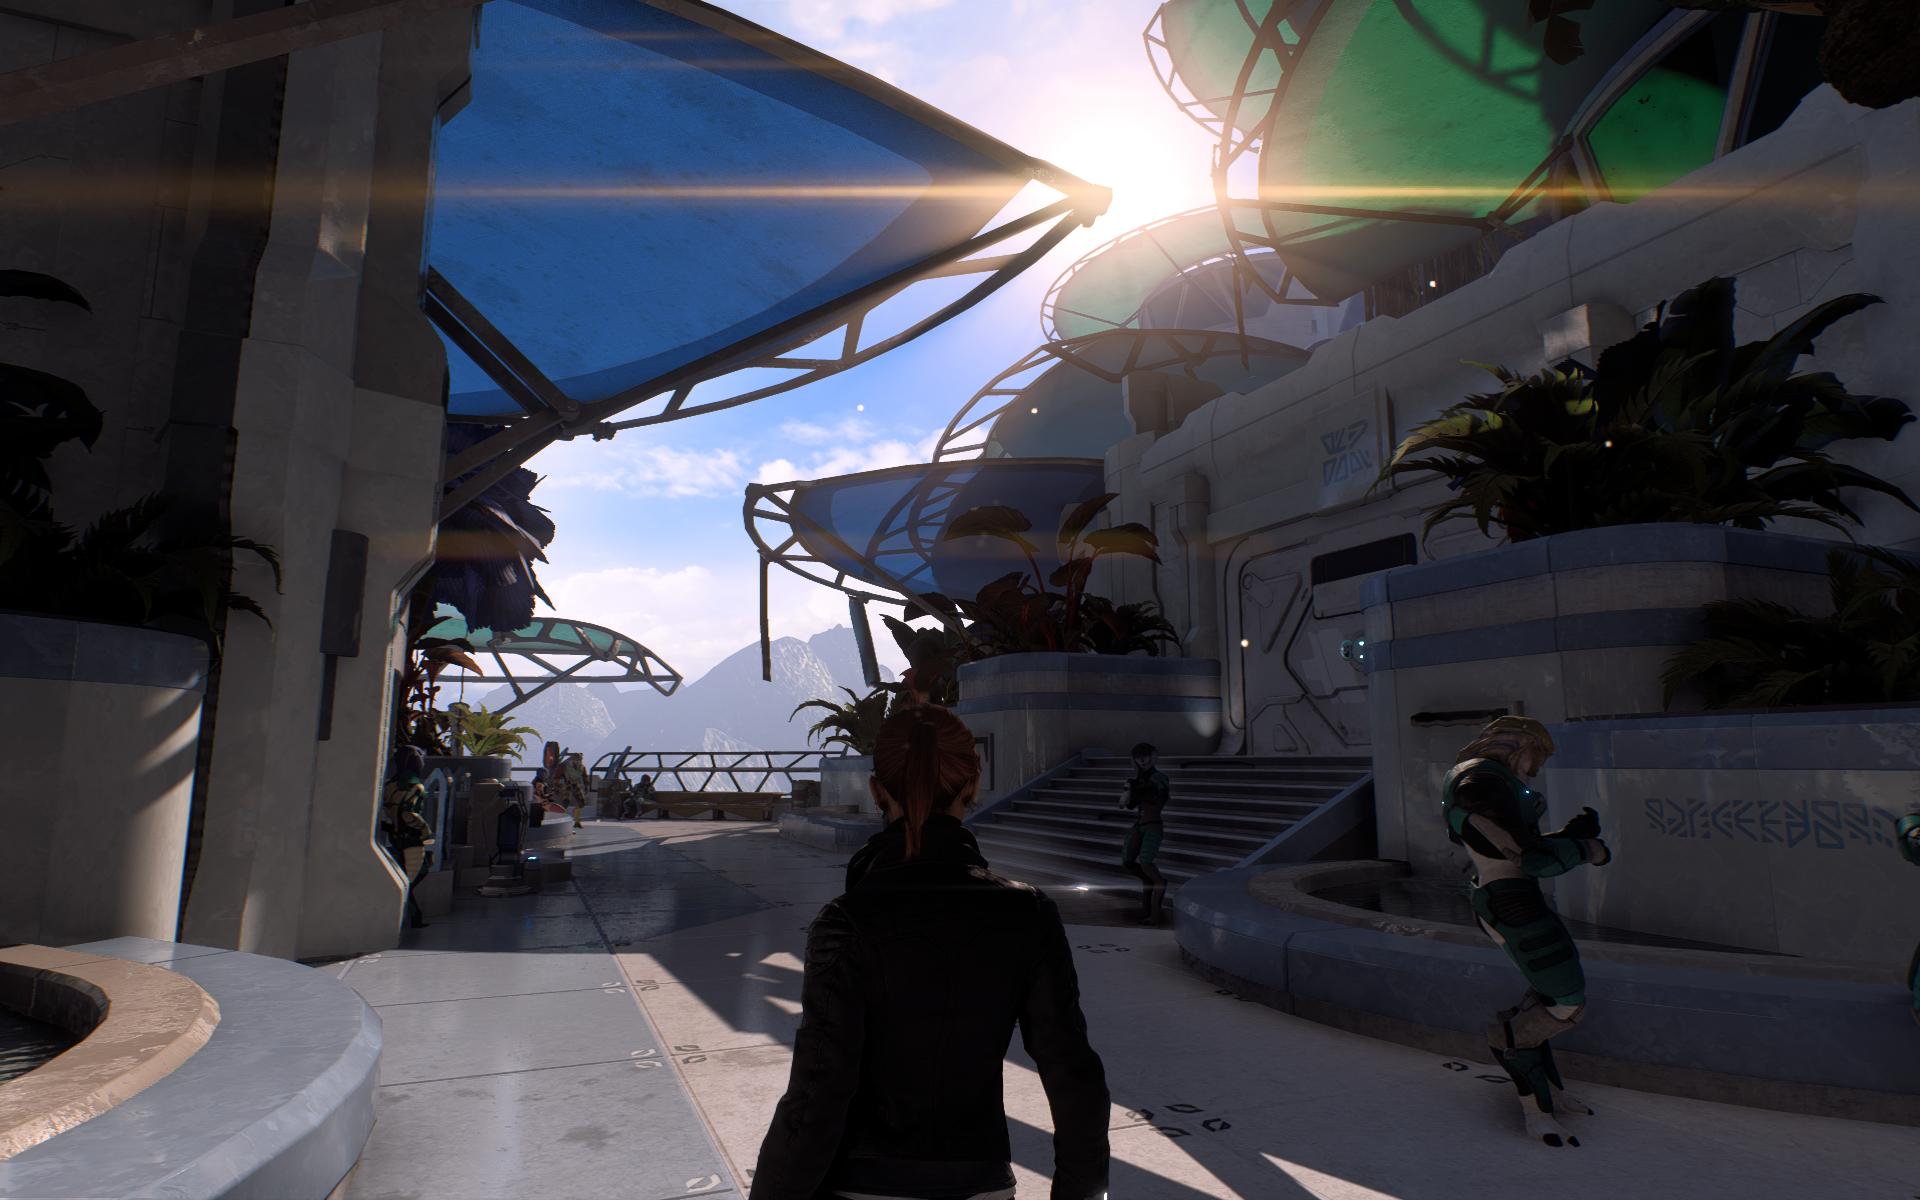 Mass Effect Andromeda Screenshot  - 08.04.30.45.png - Mass Effect: Andromeda